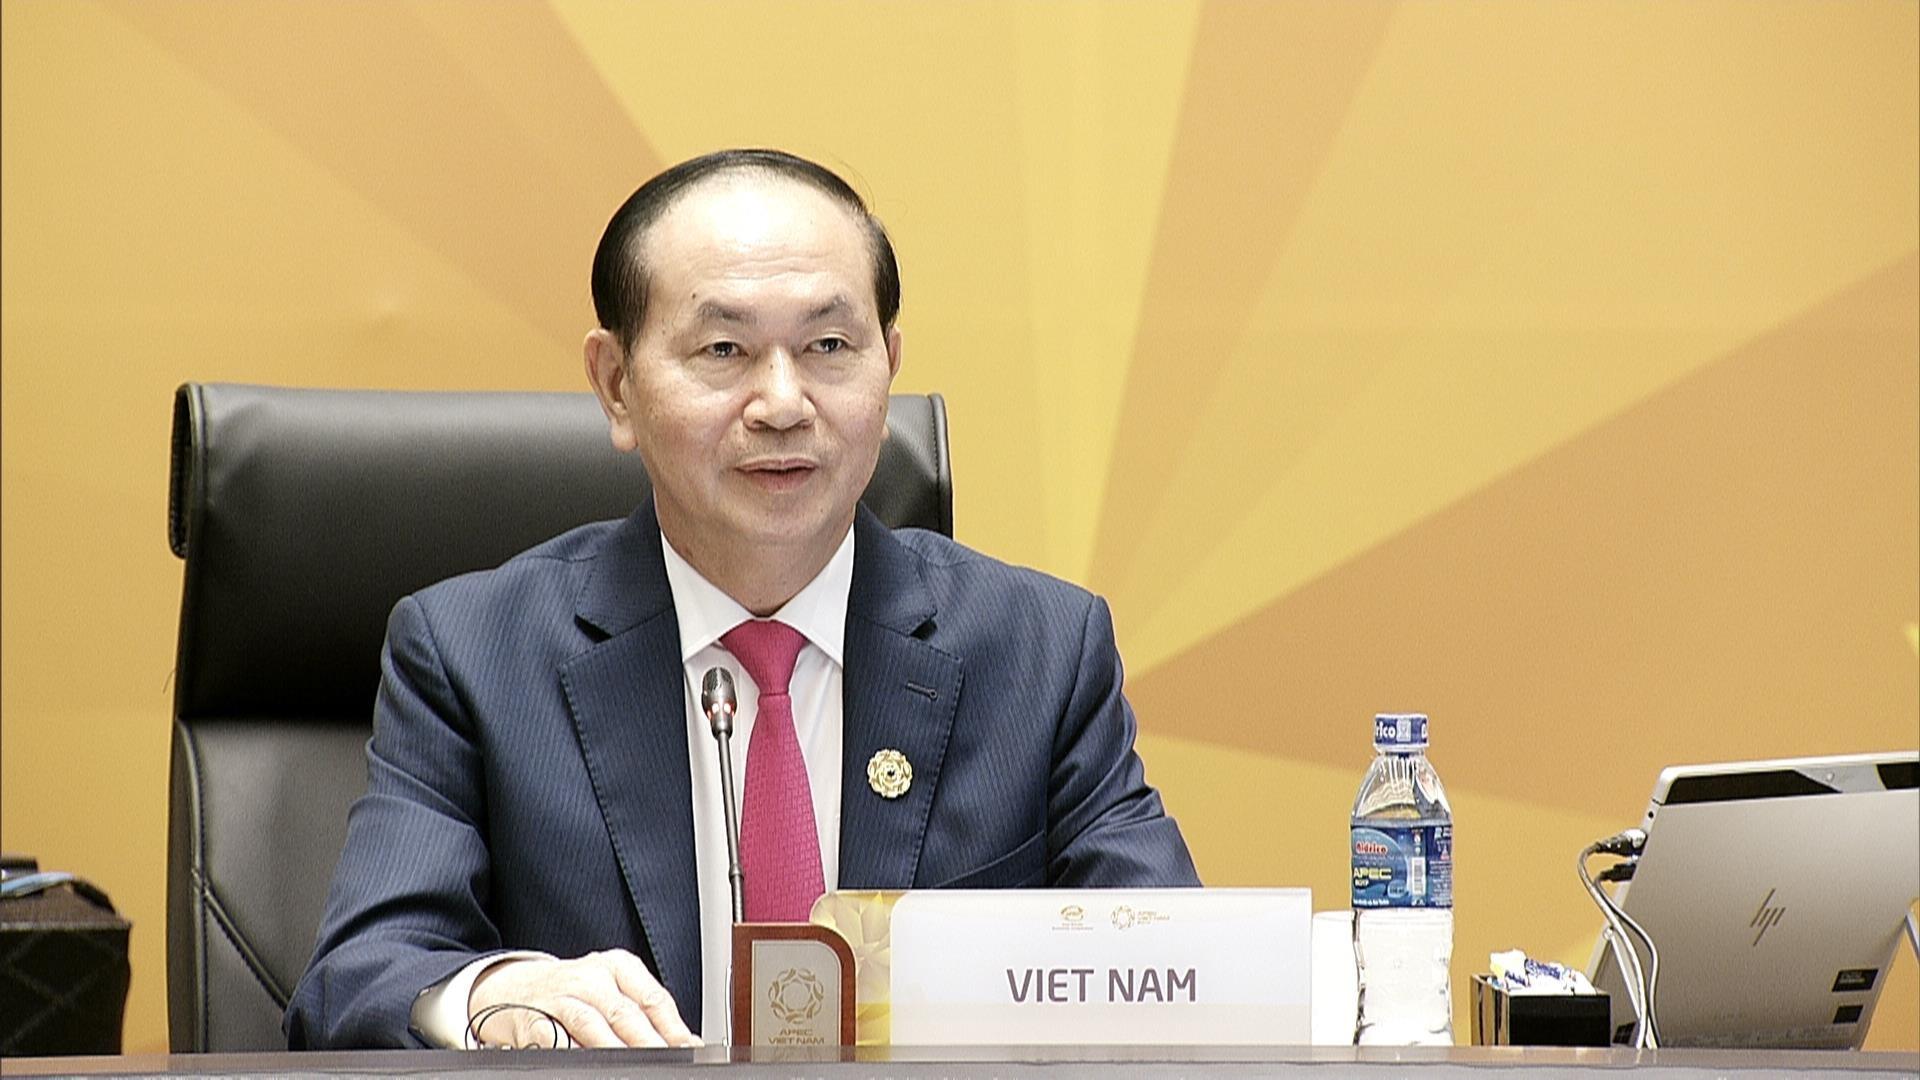 Nhat ky APEC 11/11: Ong Trump khong di 'The Beast' khi roi Da Nang hinh anh 6